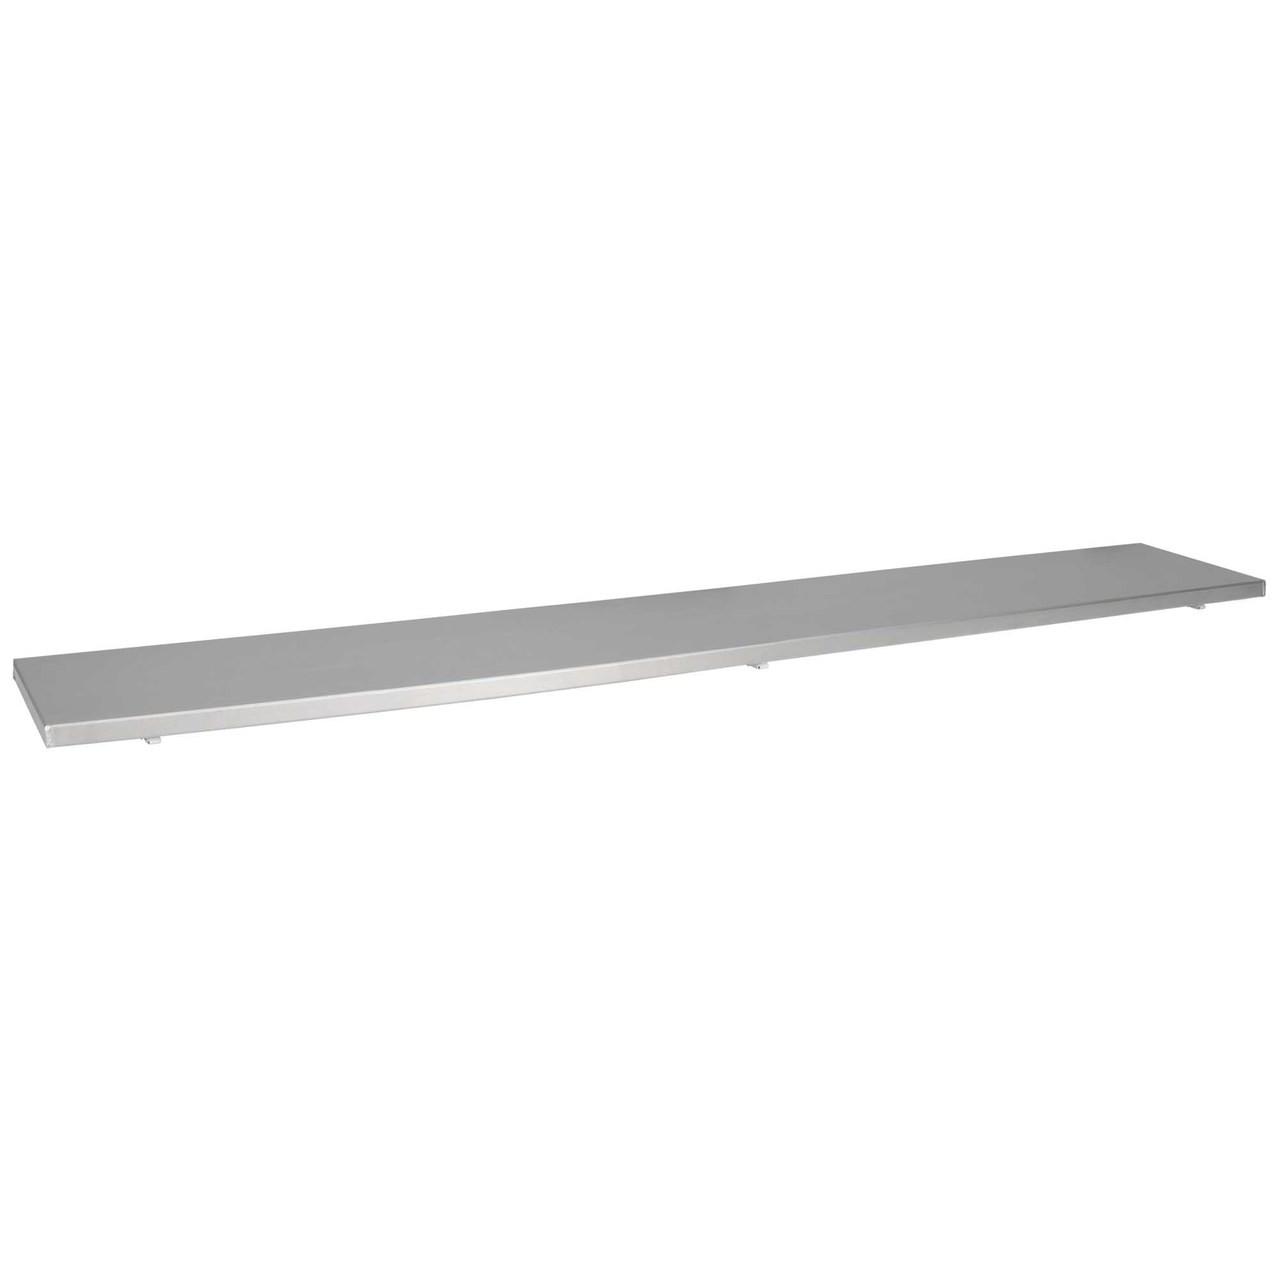 Aluminum Drop Down Concession Stand Serving Shelf